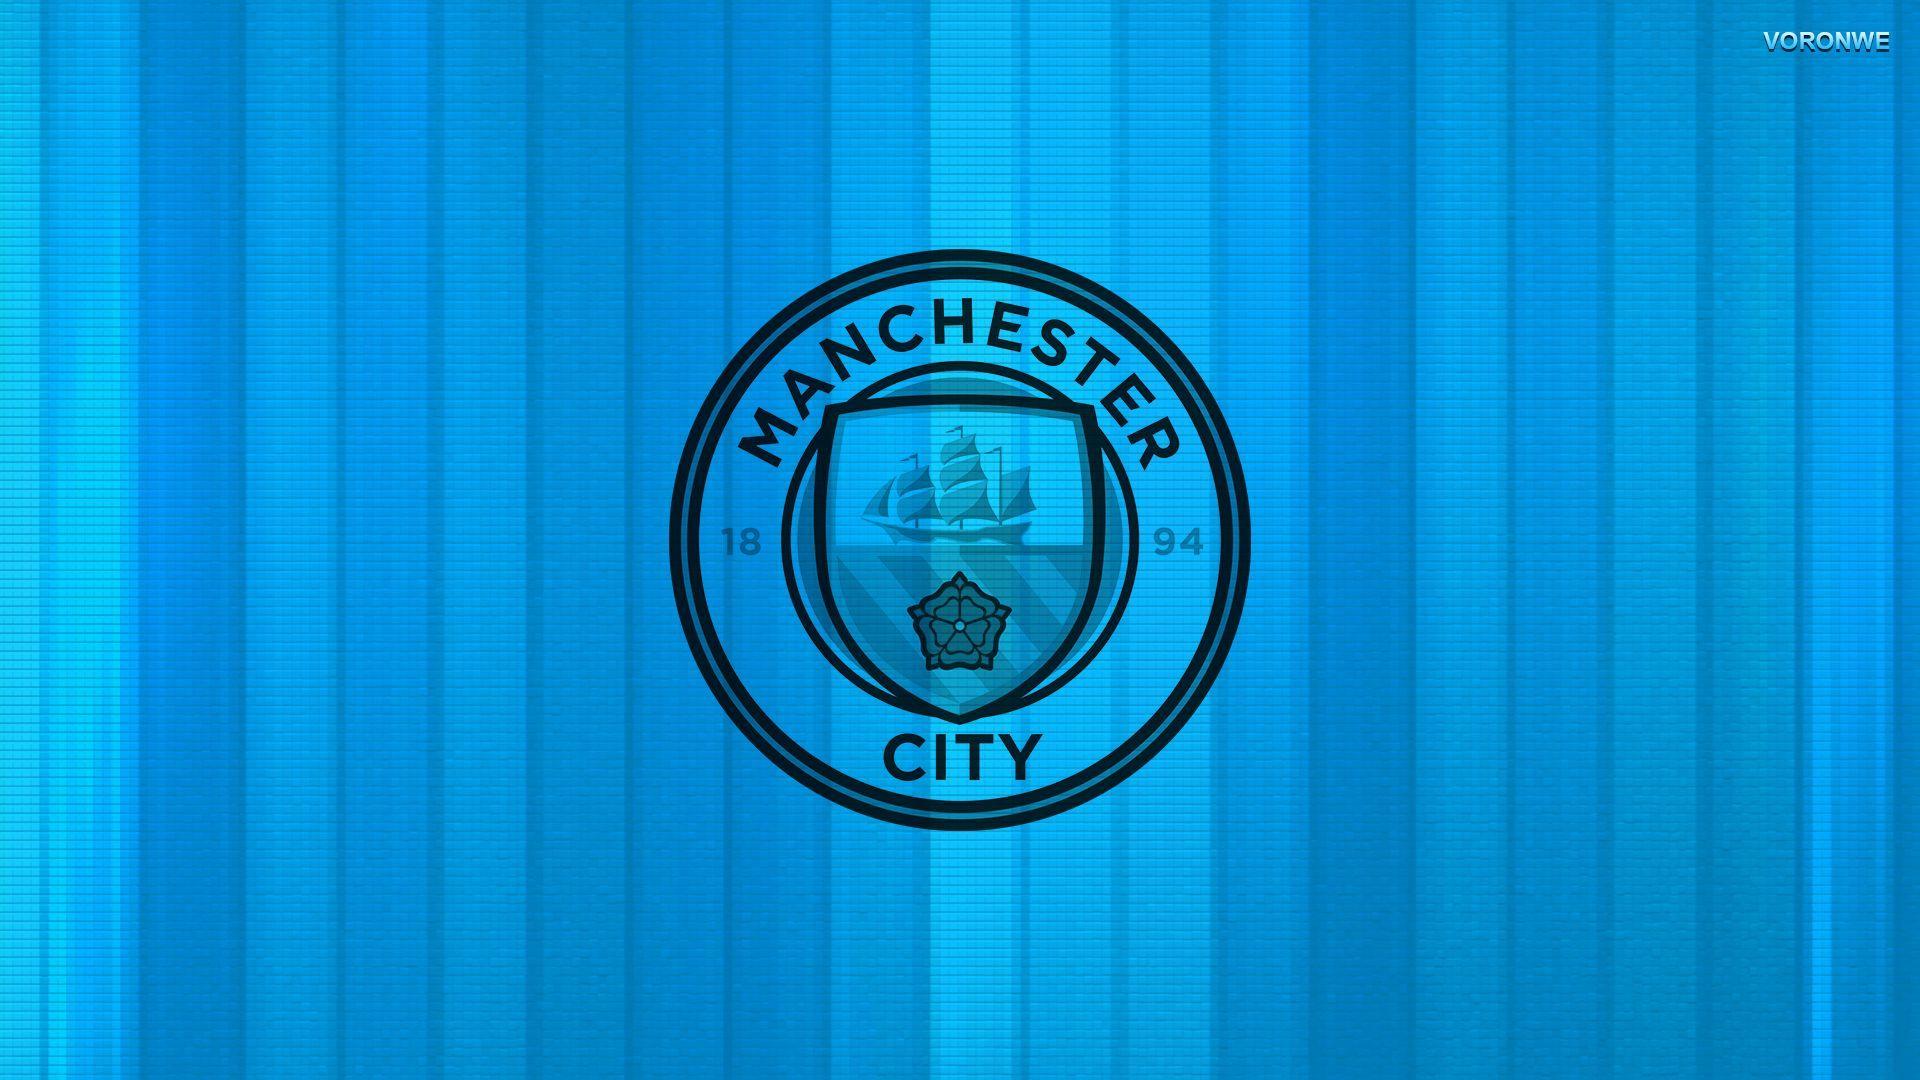 Manchester City beautiful wallpaper